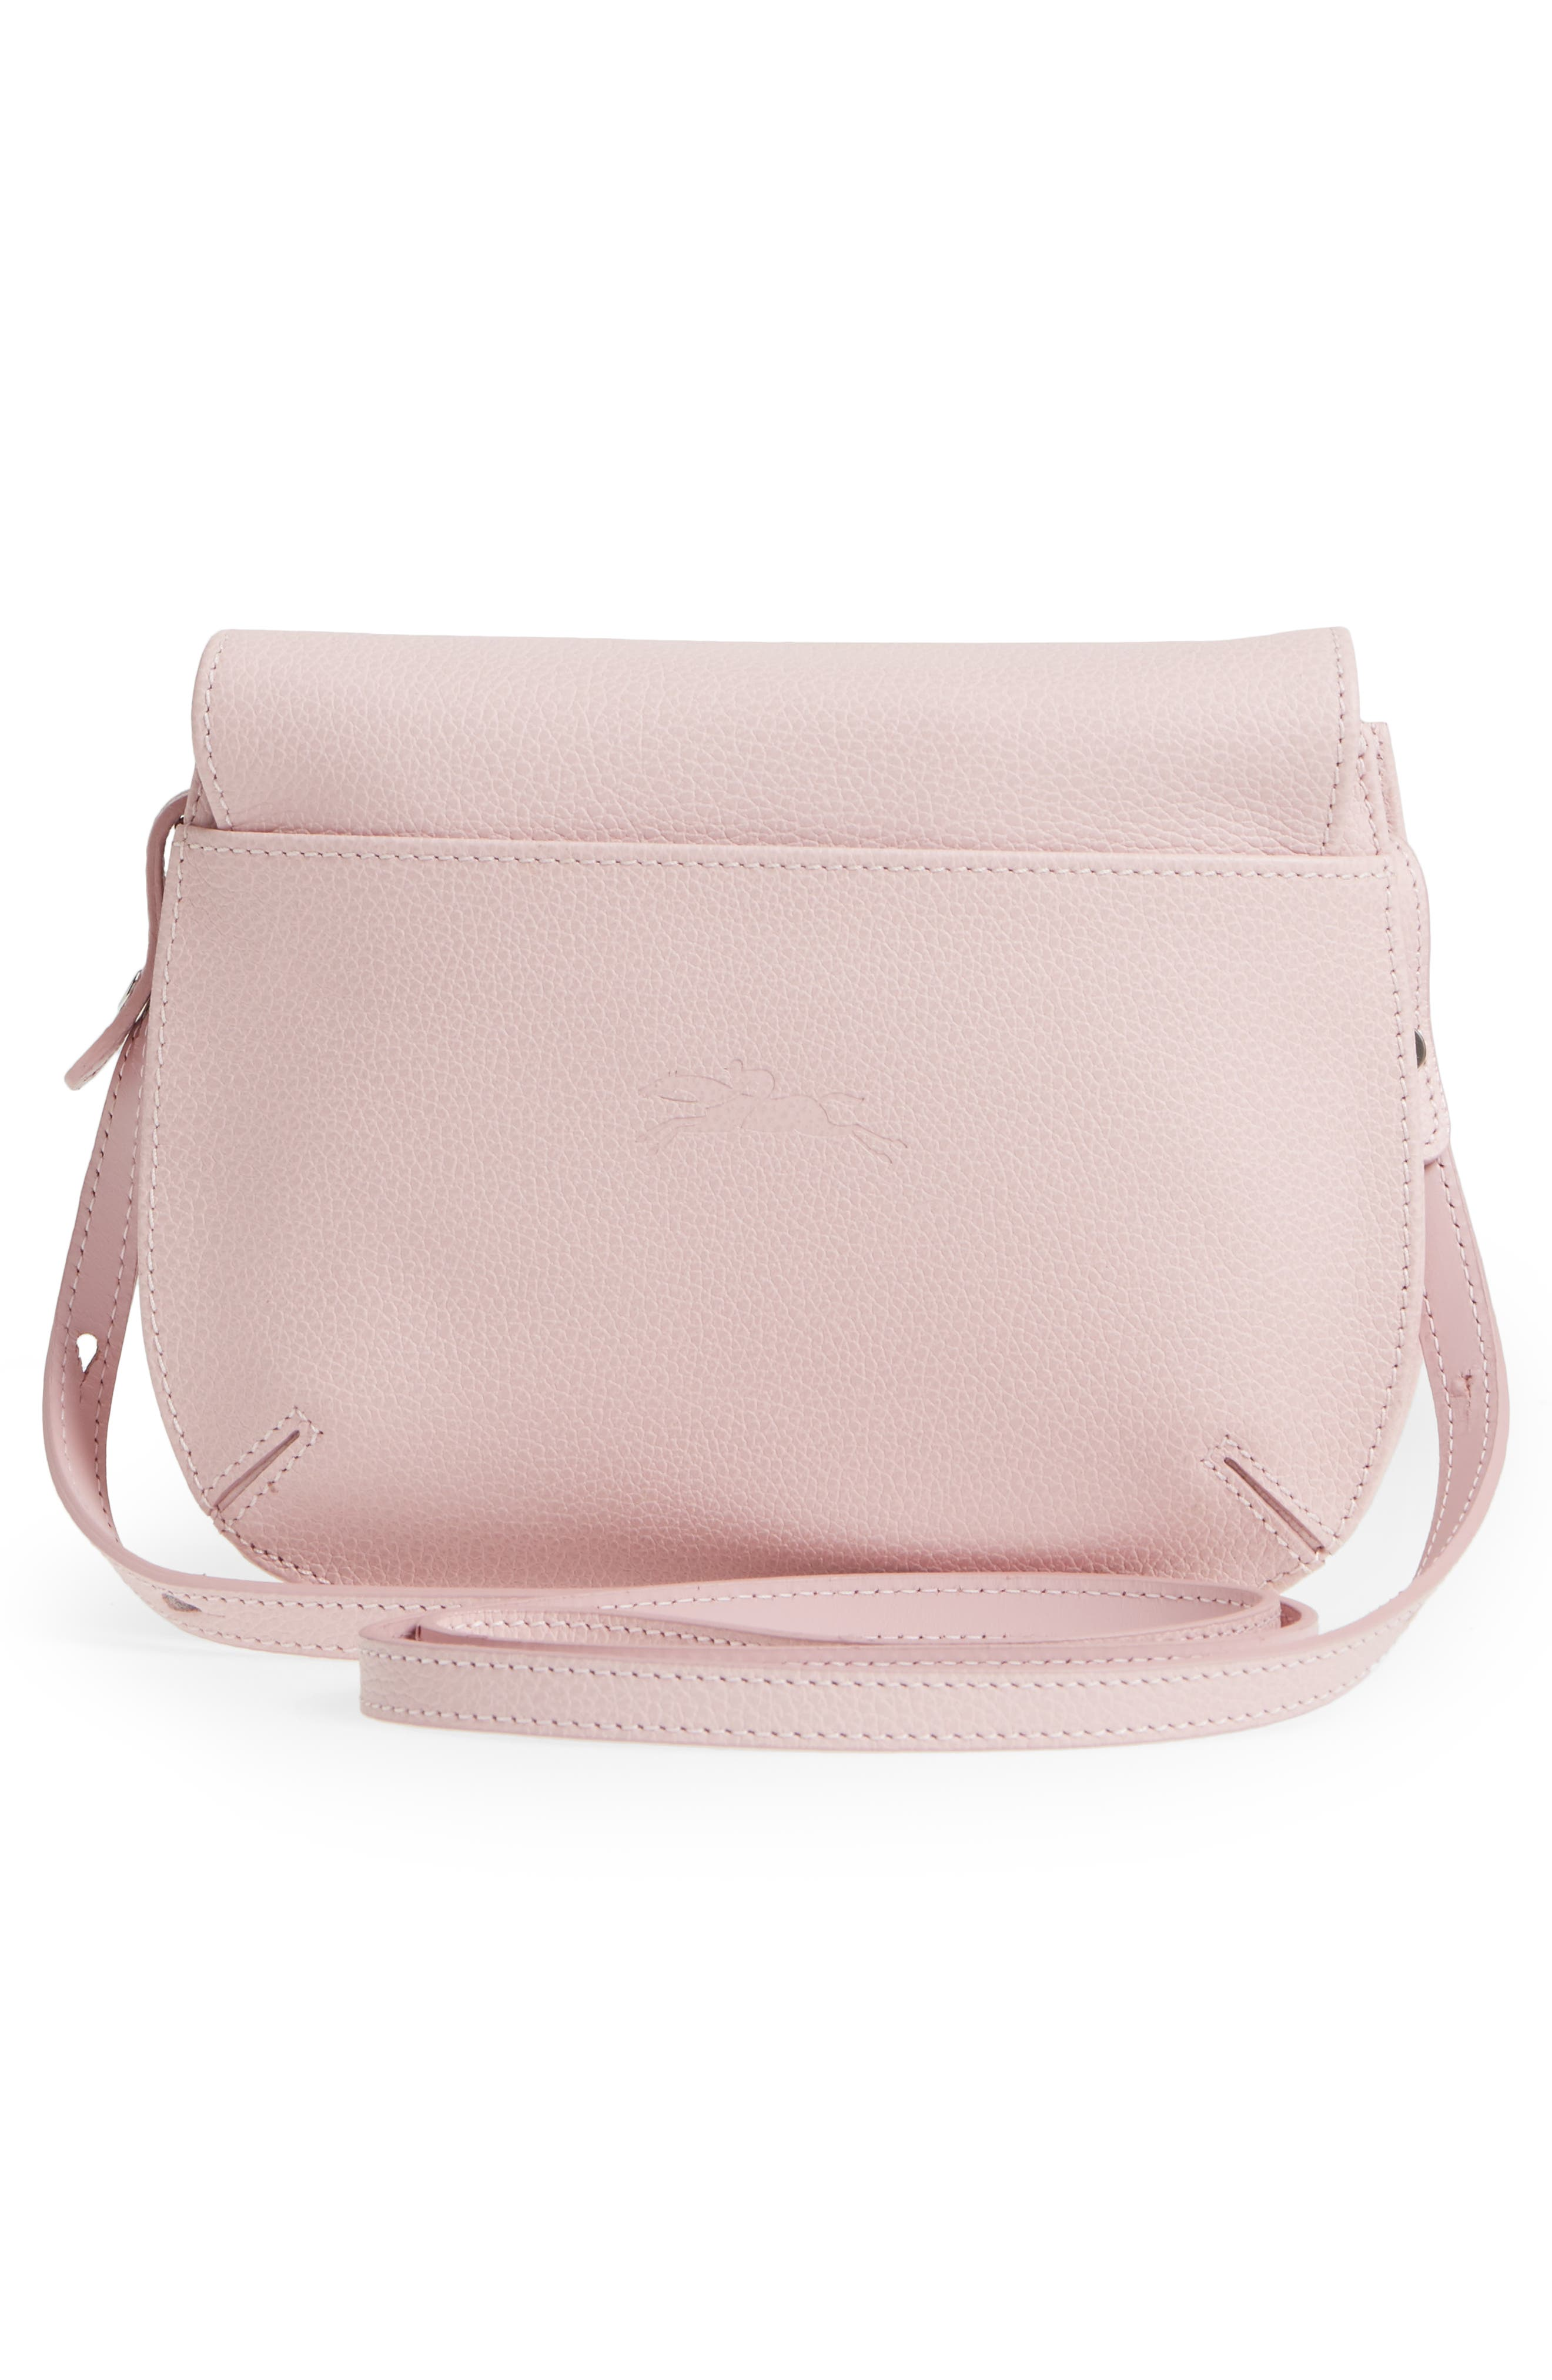 Alternate Image 3  - Longchamp Small Le Foulonne Leather Crossbody Bag